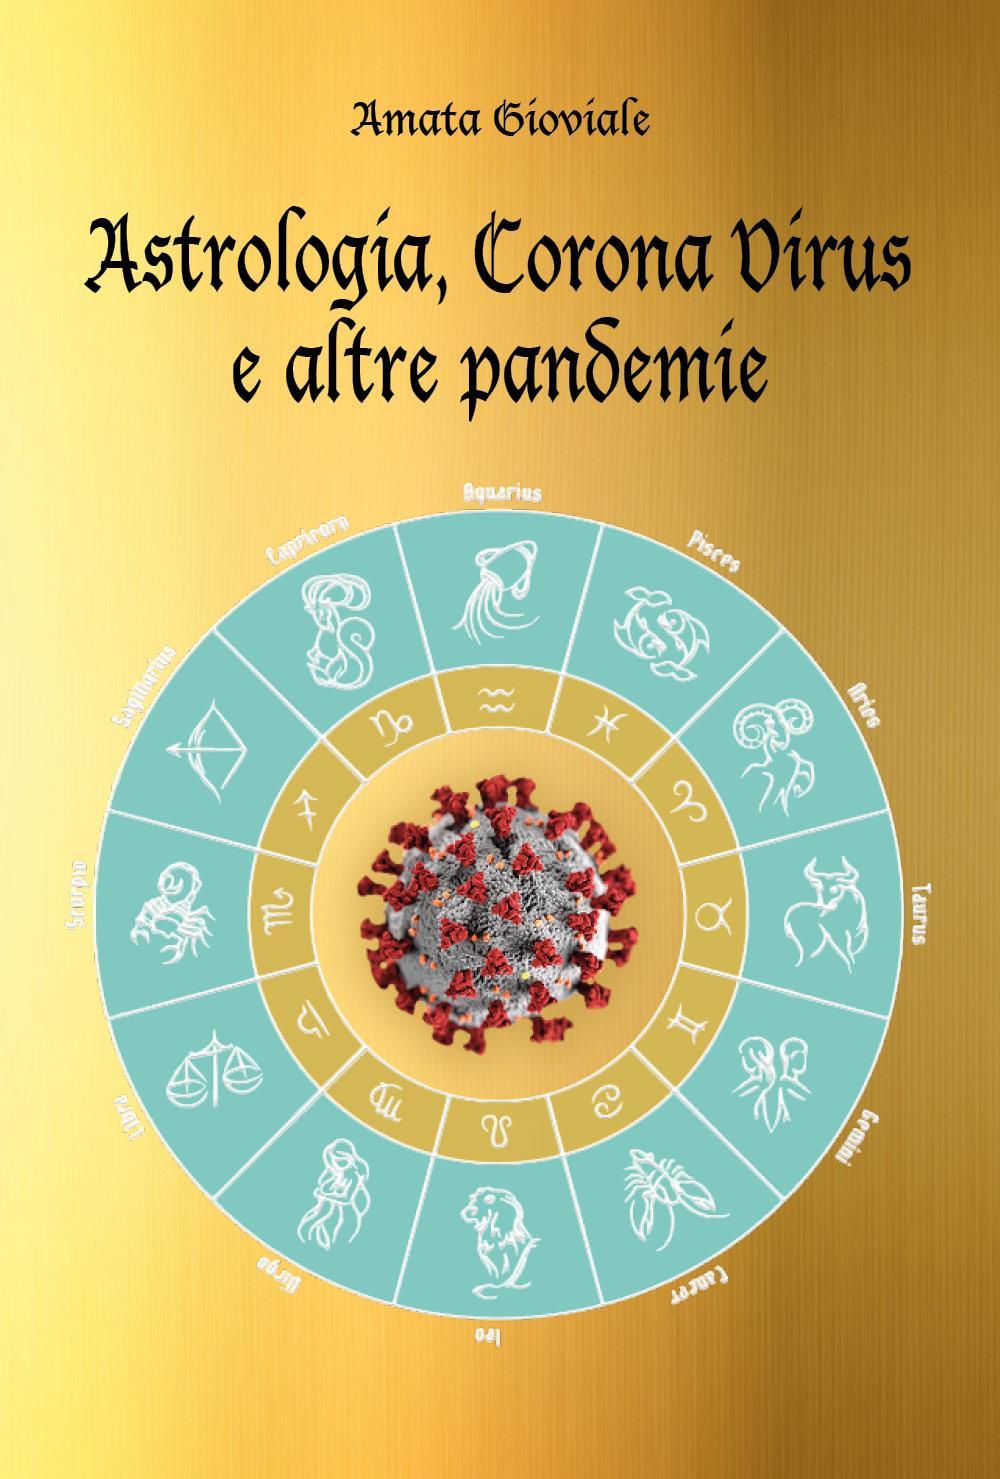 Astrologia, Corona Virus e altre pandemie